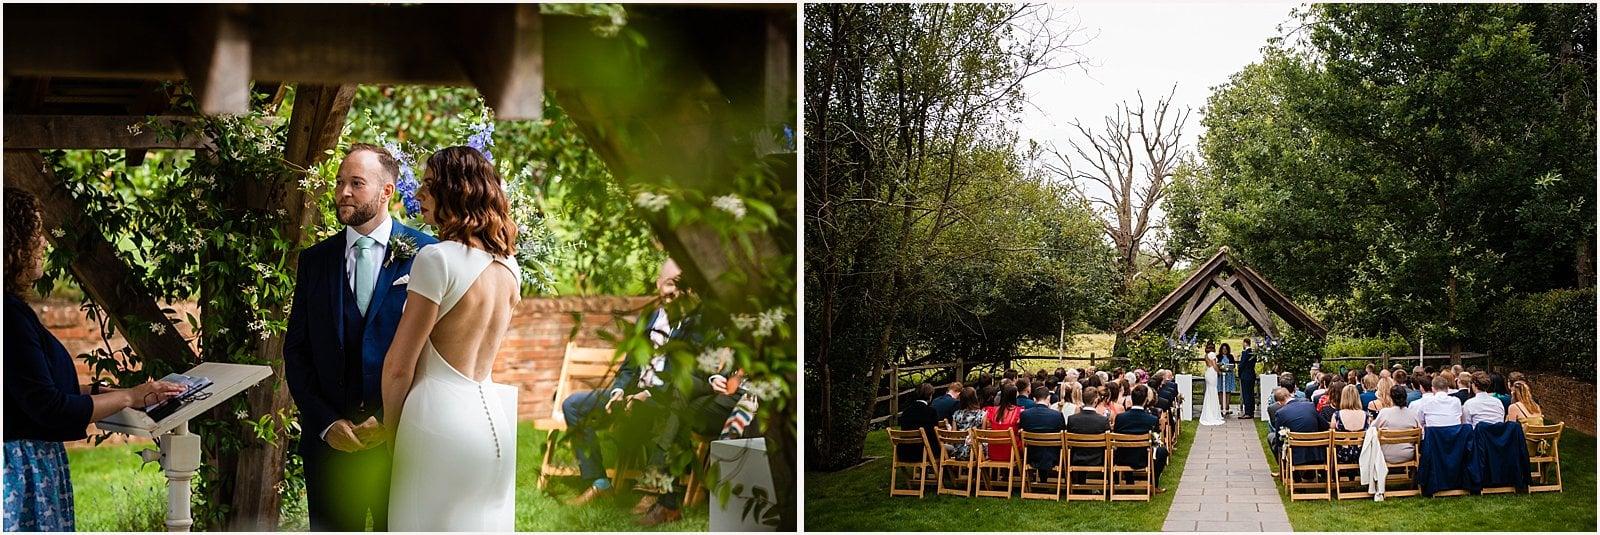 Millbridge Court Wedding - stunning summer wedding - wedding photography 35